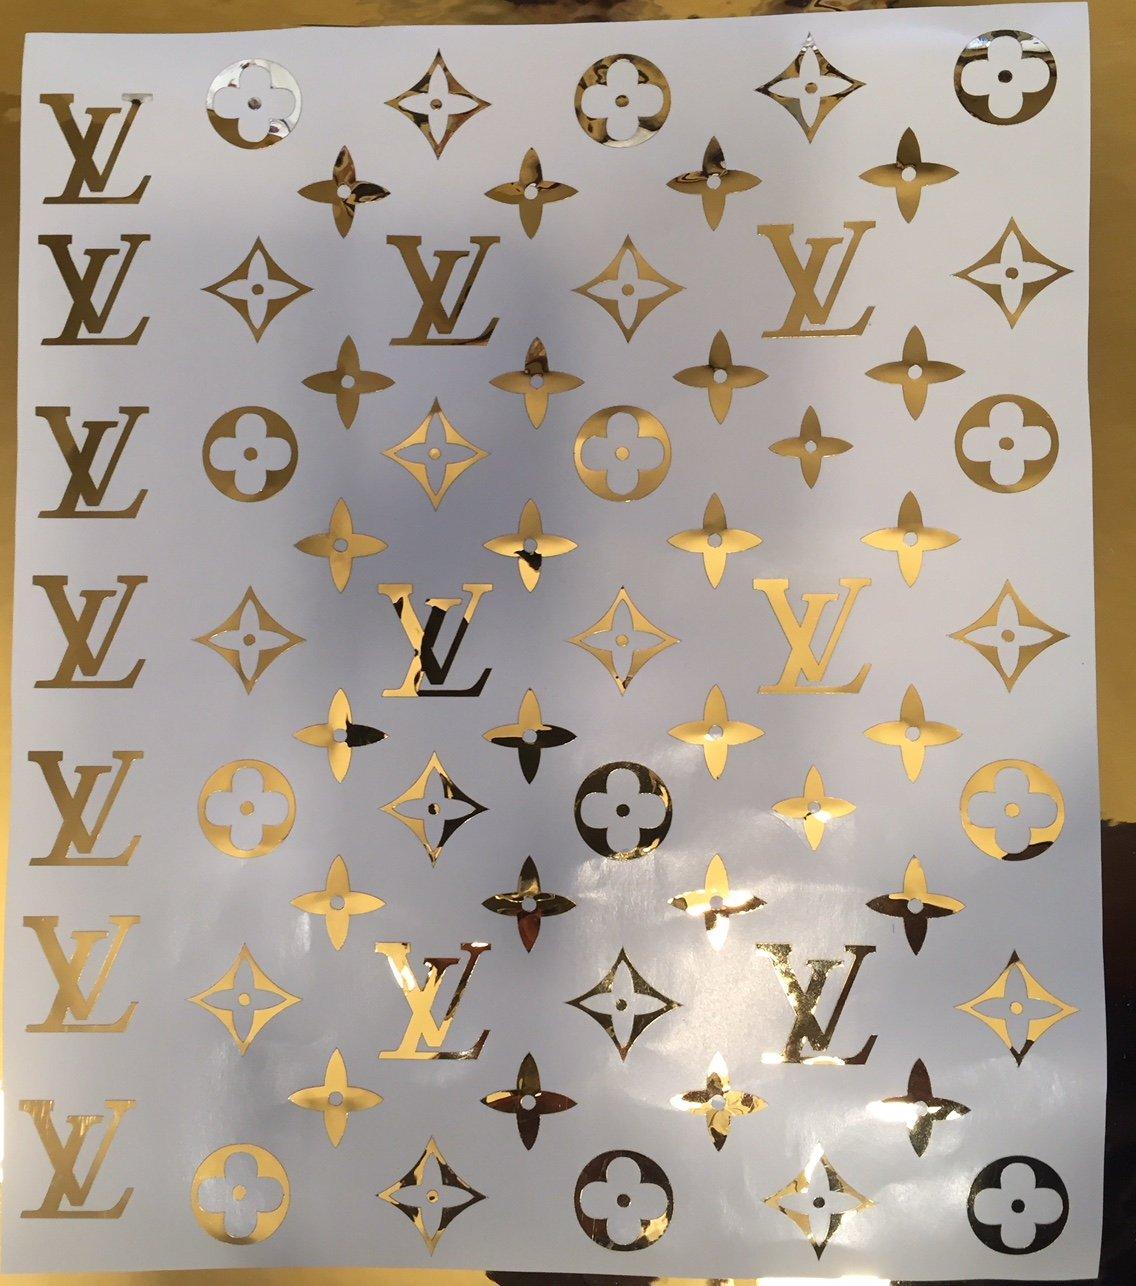 Louie Vuitton Wallpapers Virgil Abloh Louis Vuitton Pattern 70995 Hd Wallpaper Backgrounds Download